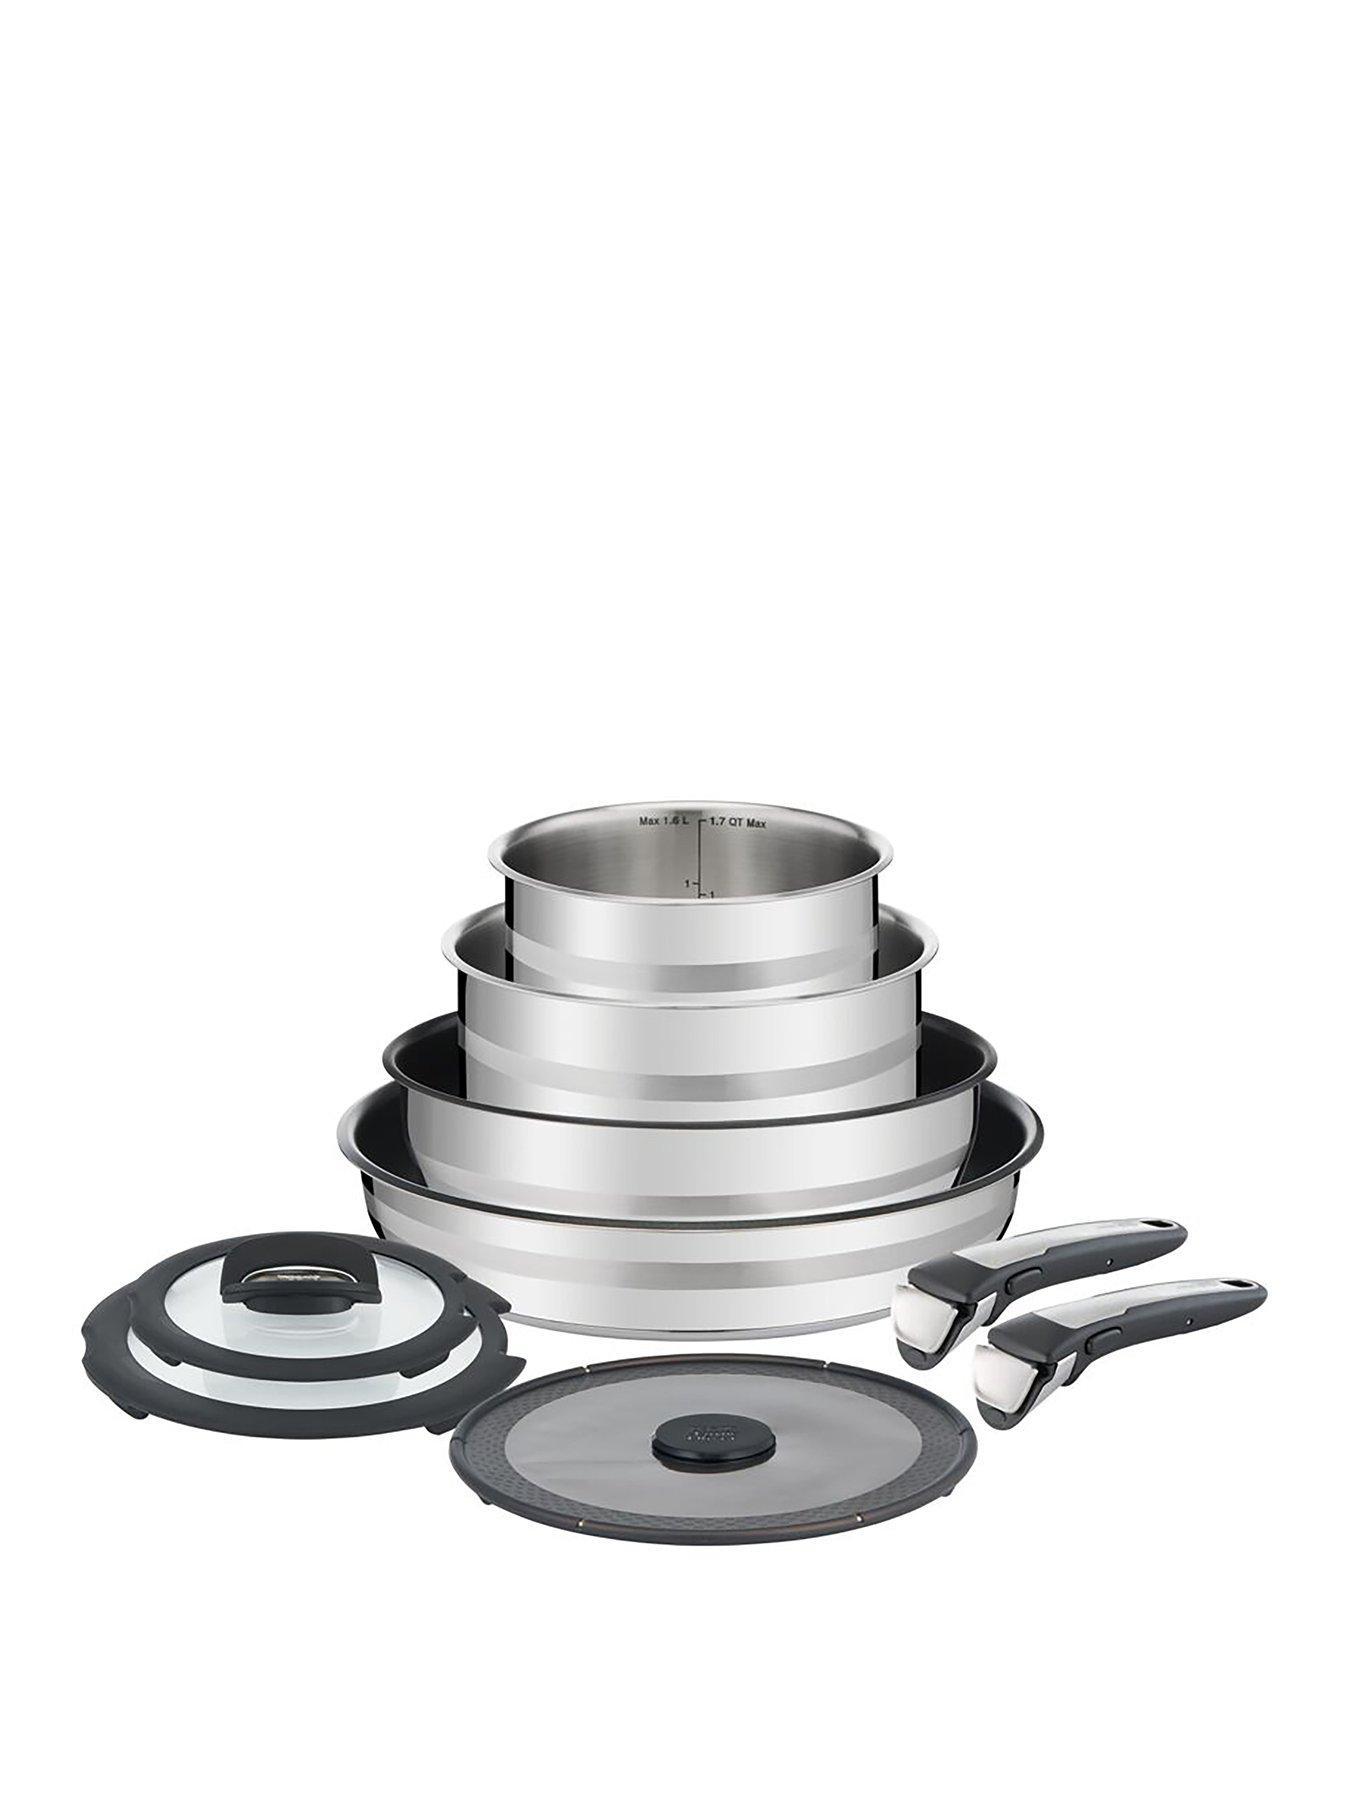 Removable Steel Insdert Handle for Tefal Ingenio Pan Sets Twin Pack 2 Handles